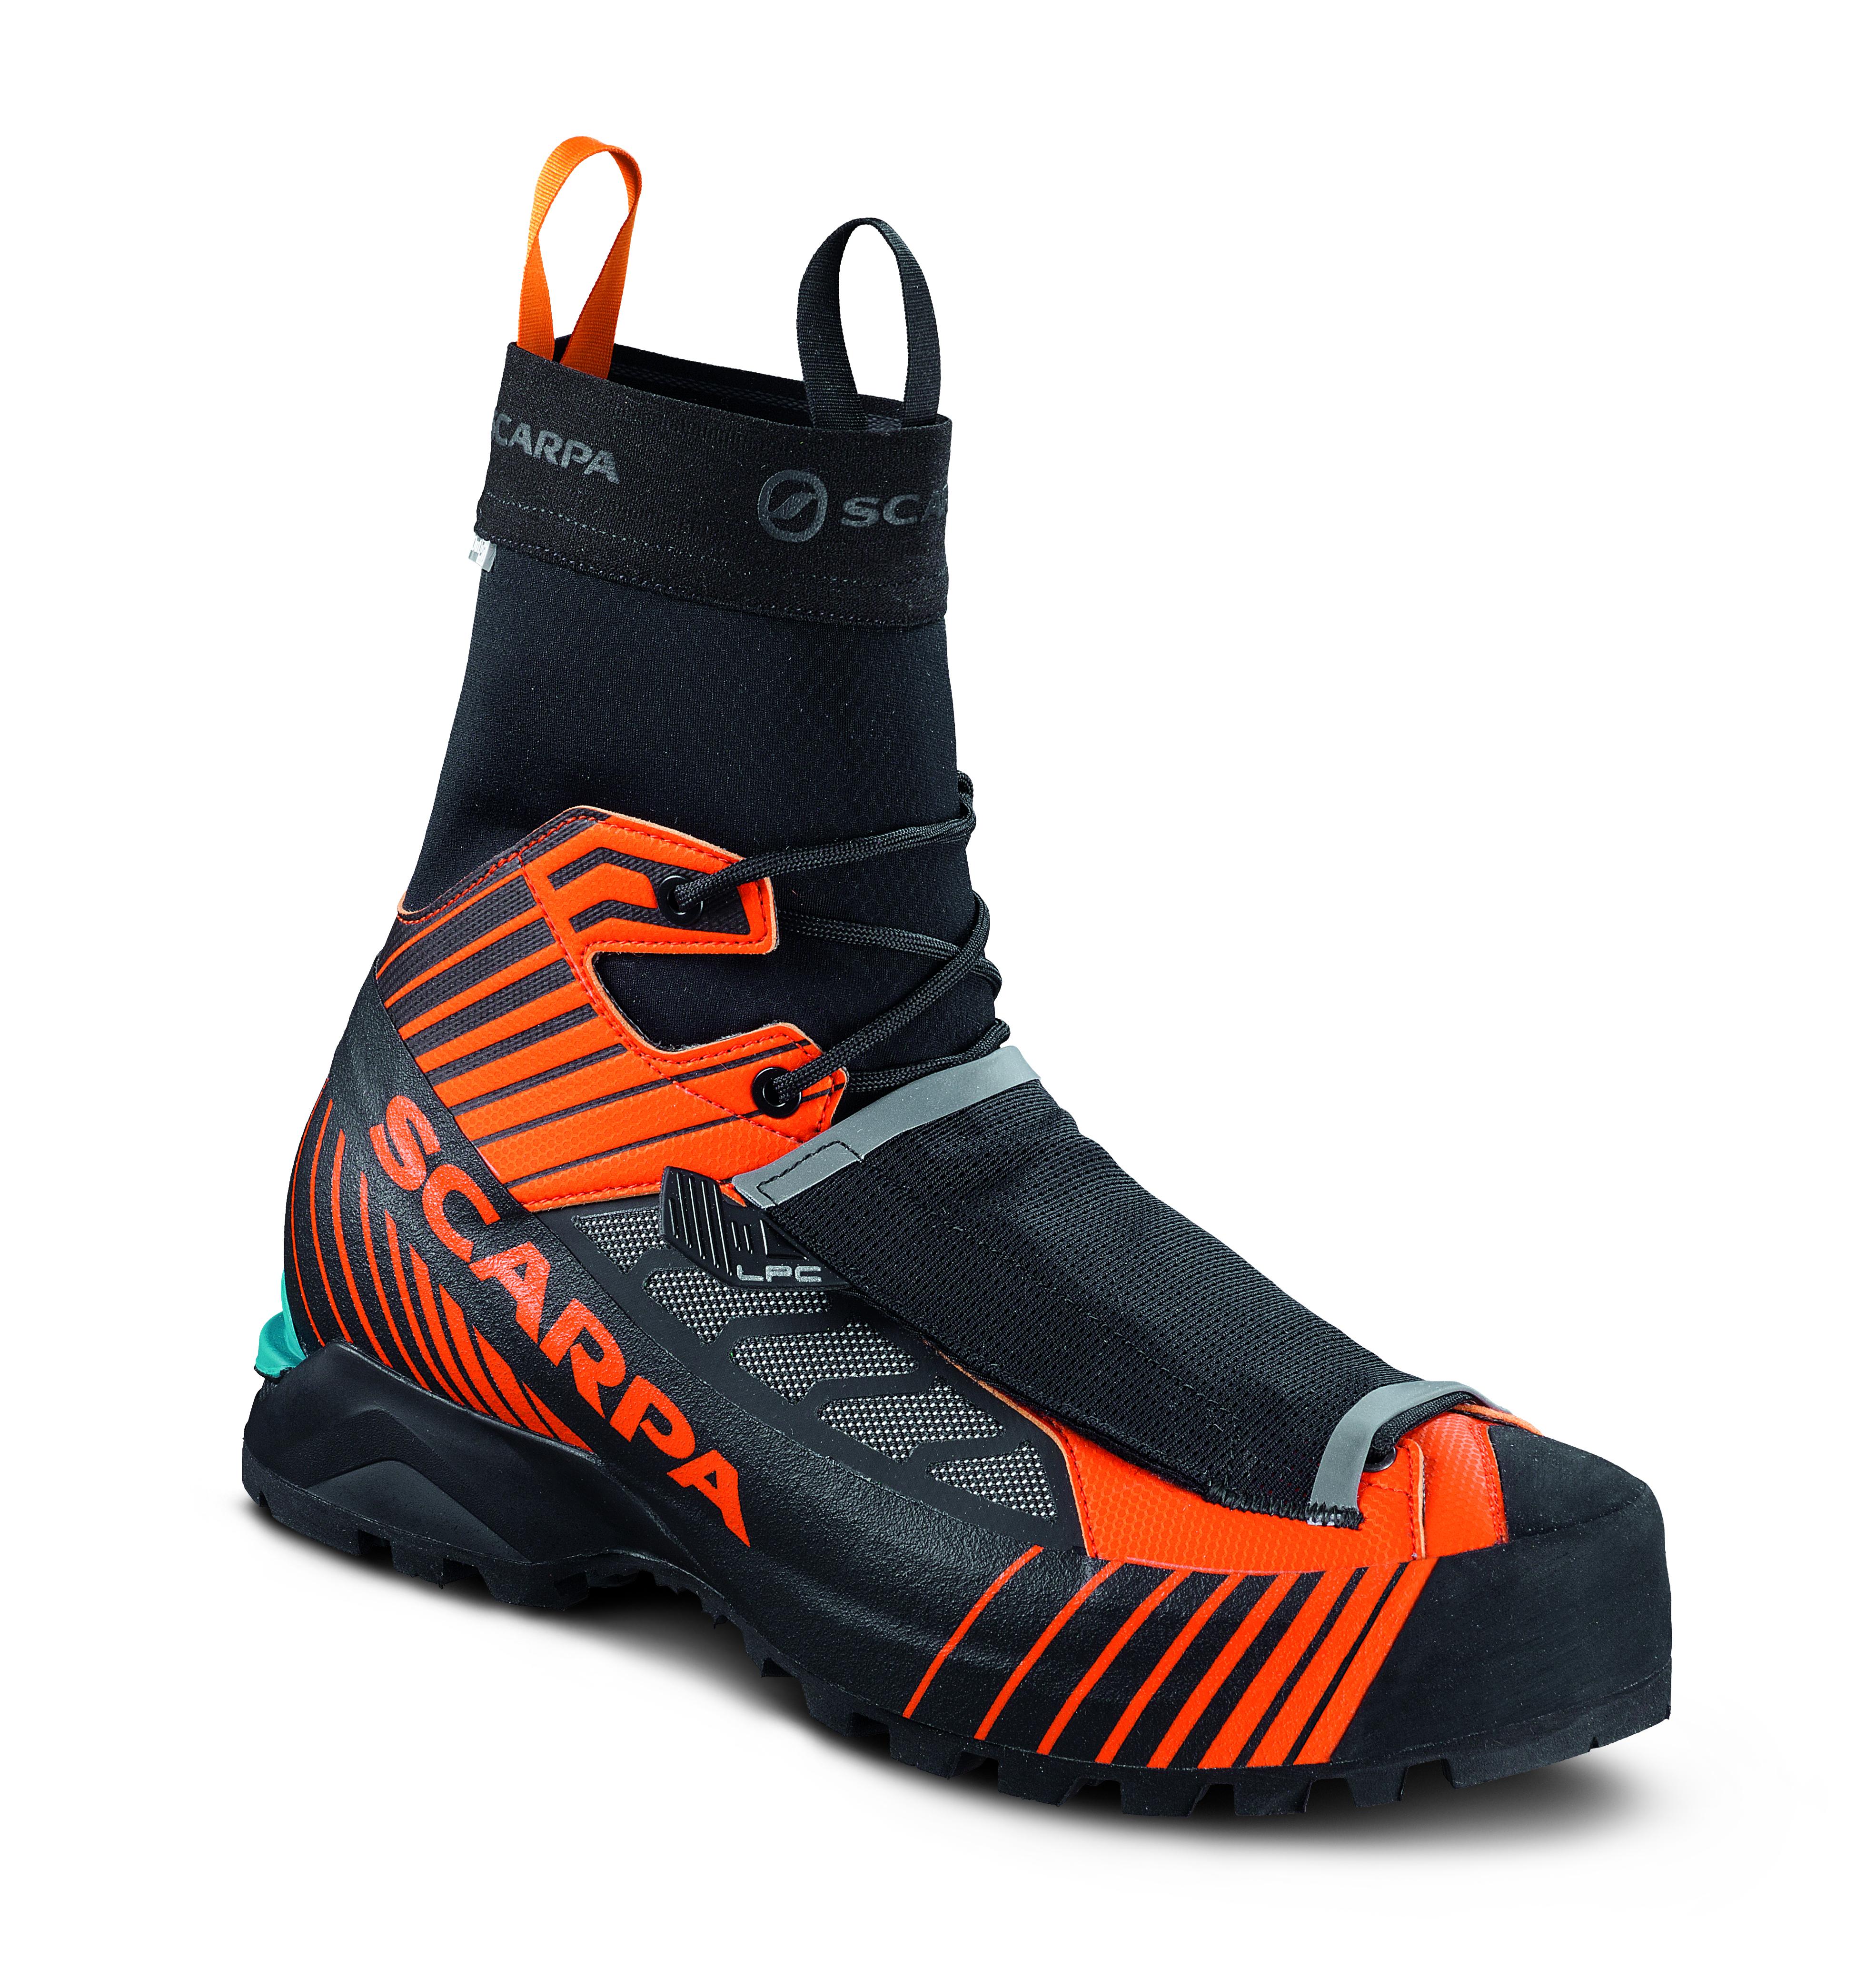 News Outdoor show Friedrichshafen 2017 Scarpa chaussure alpinisme La Ribelle Tech OD